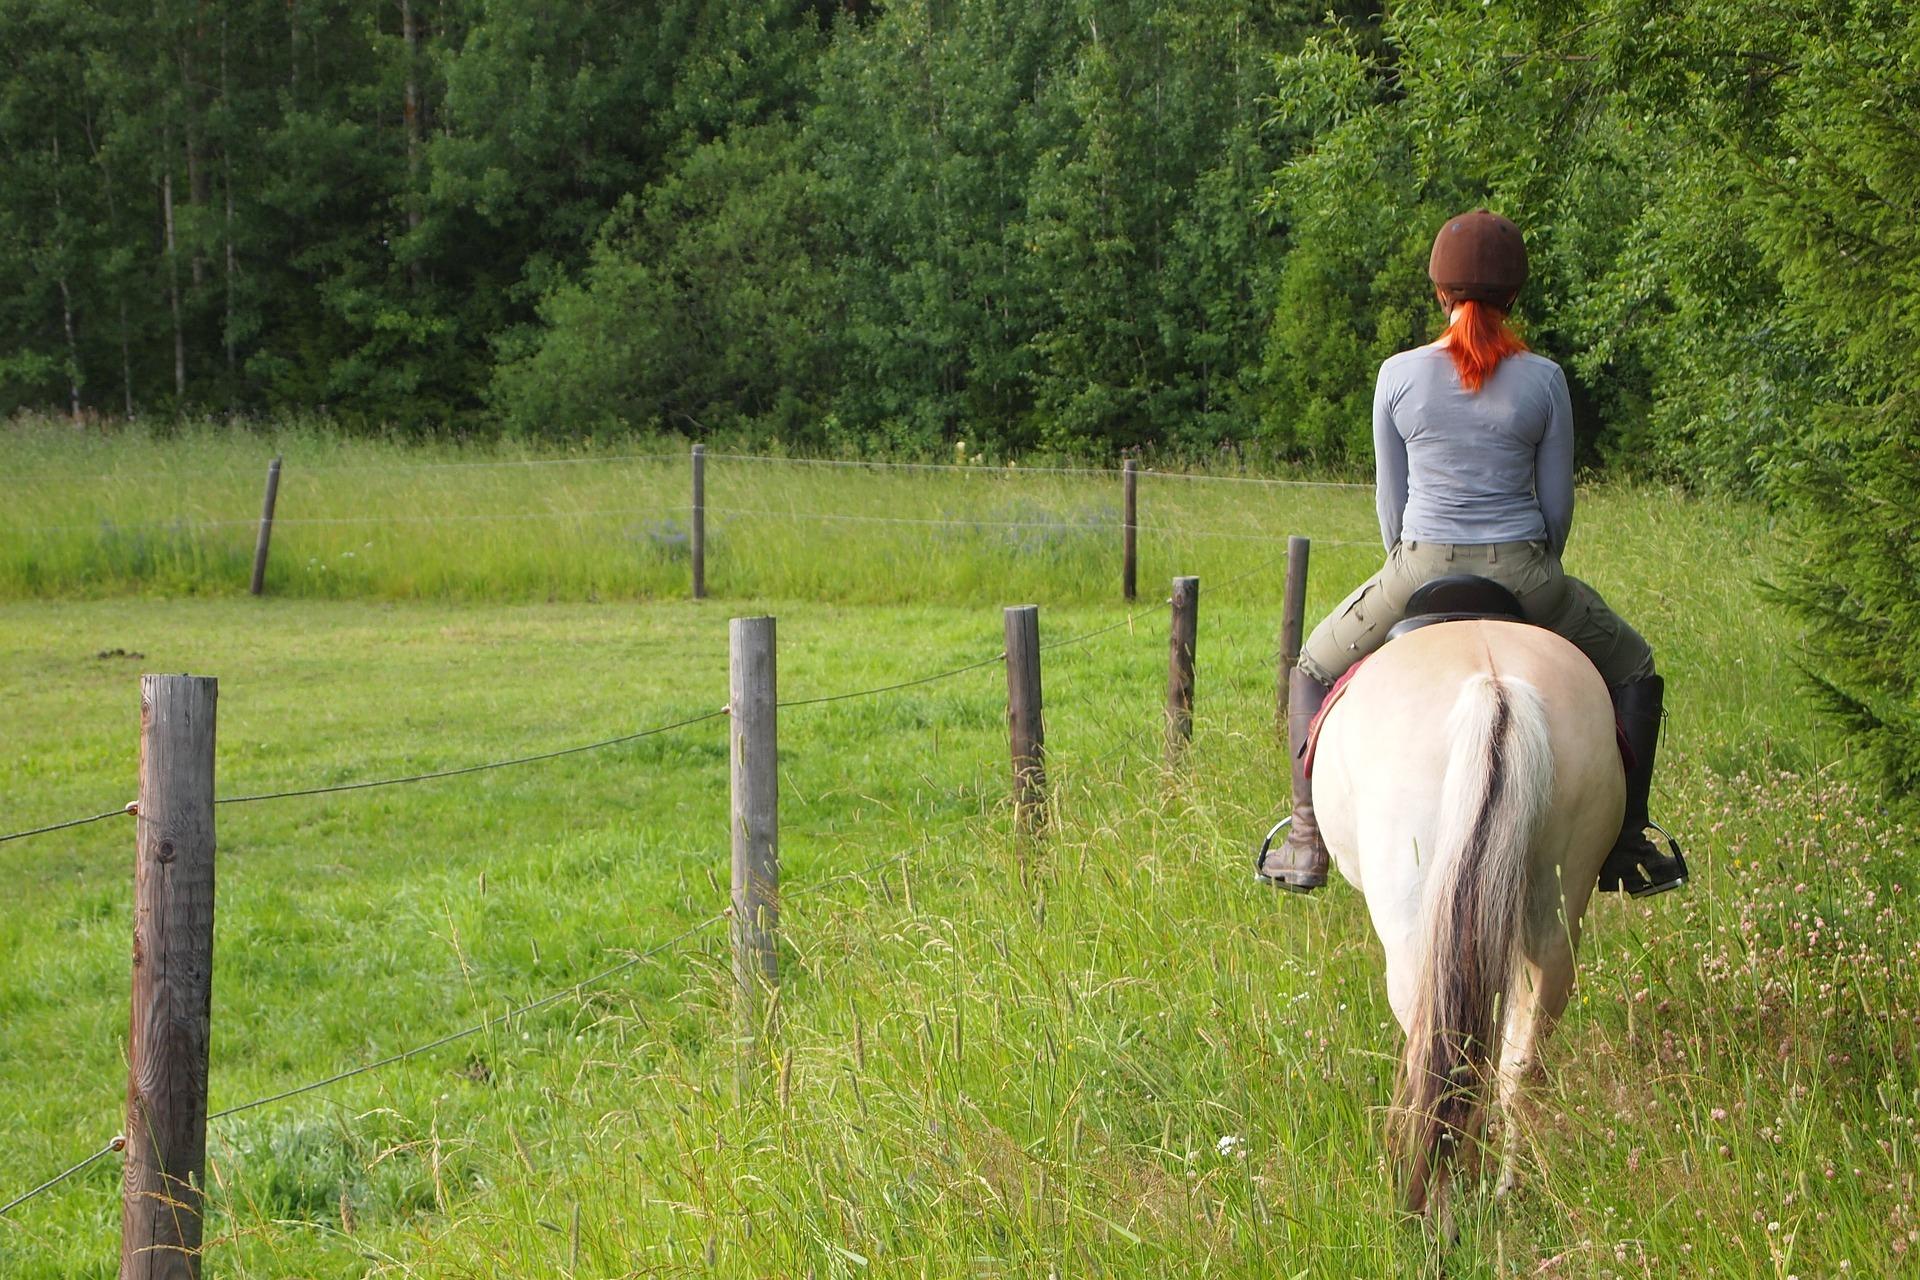 horseback-riding-3855677_1920.jpg